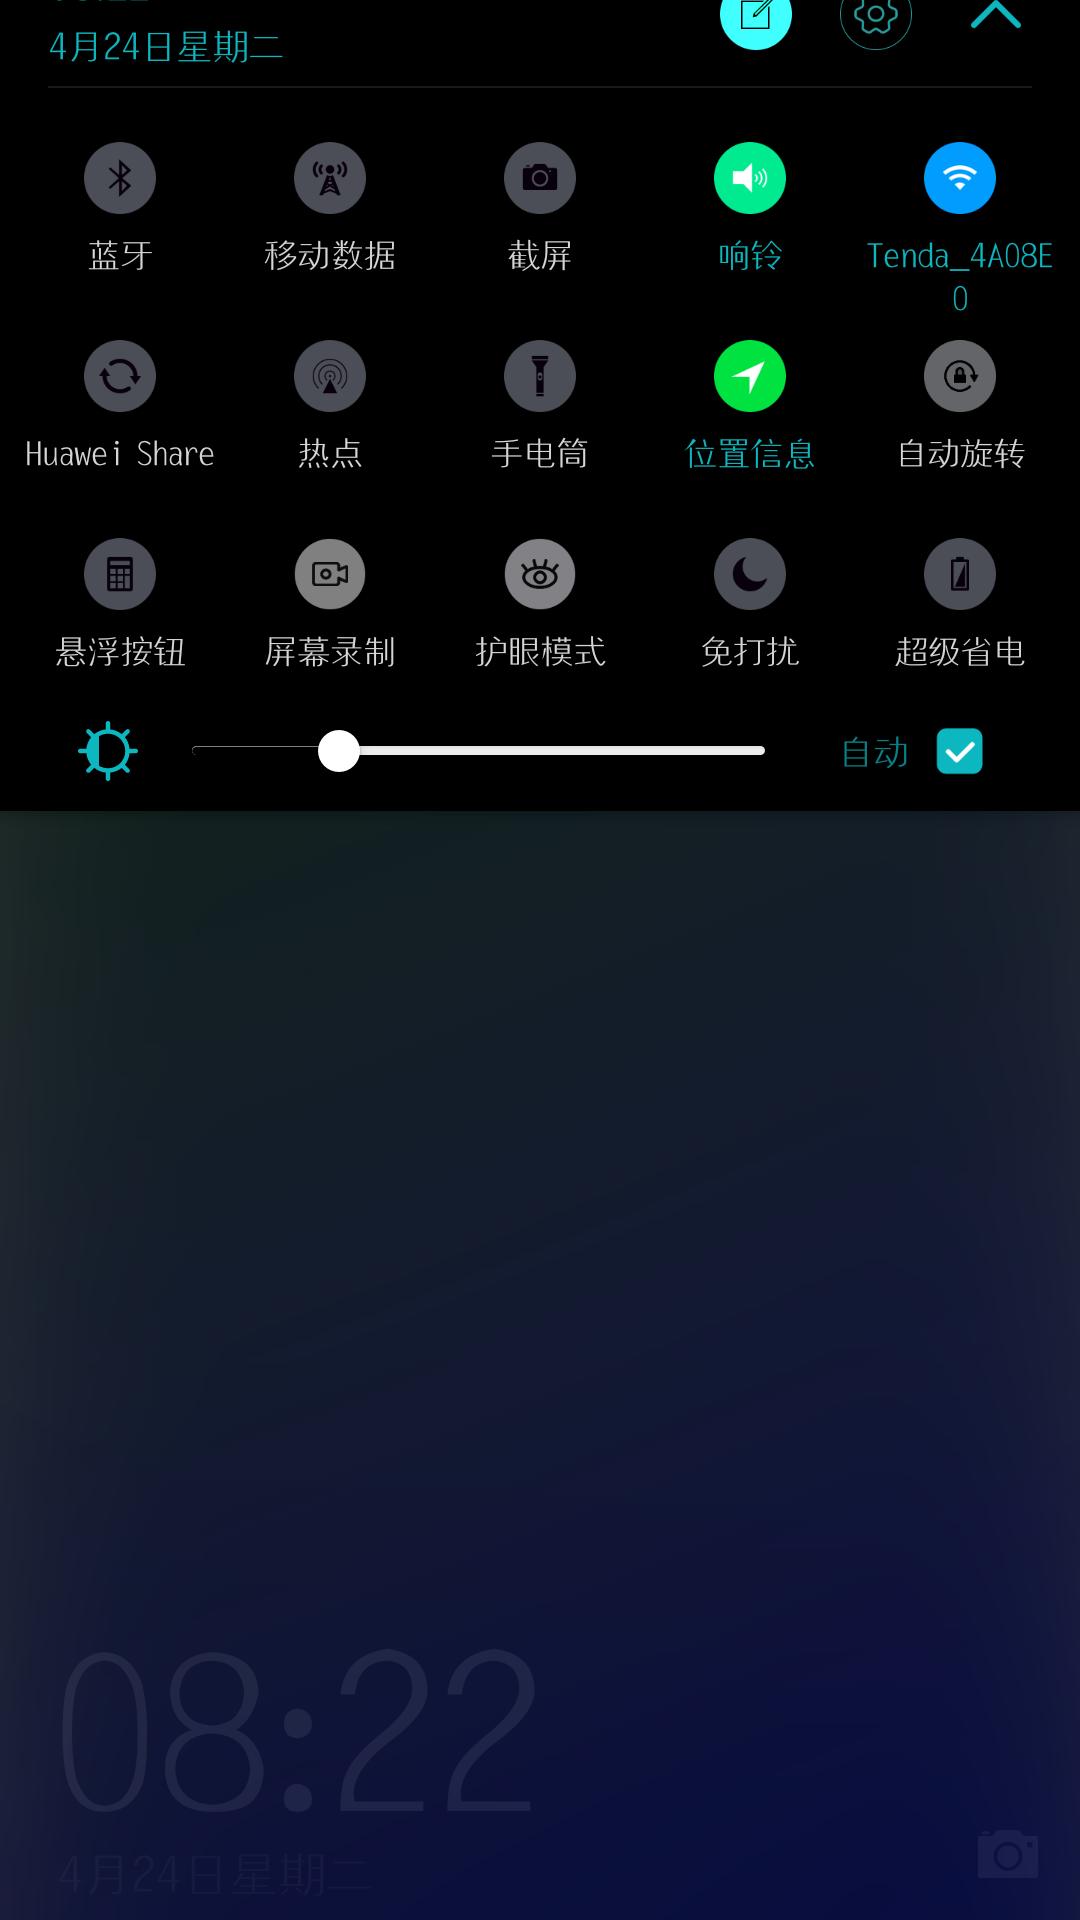 Screenshot_20180424-082237.png